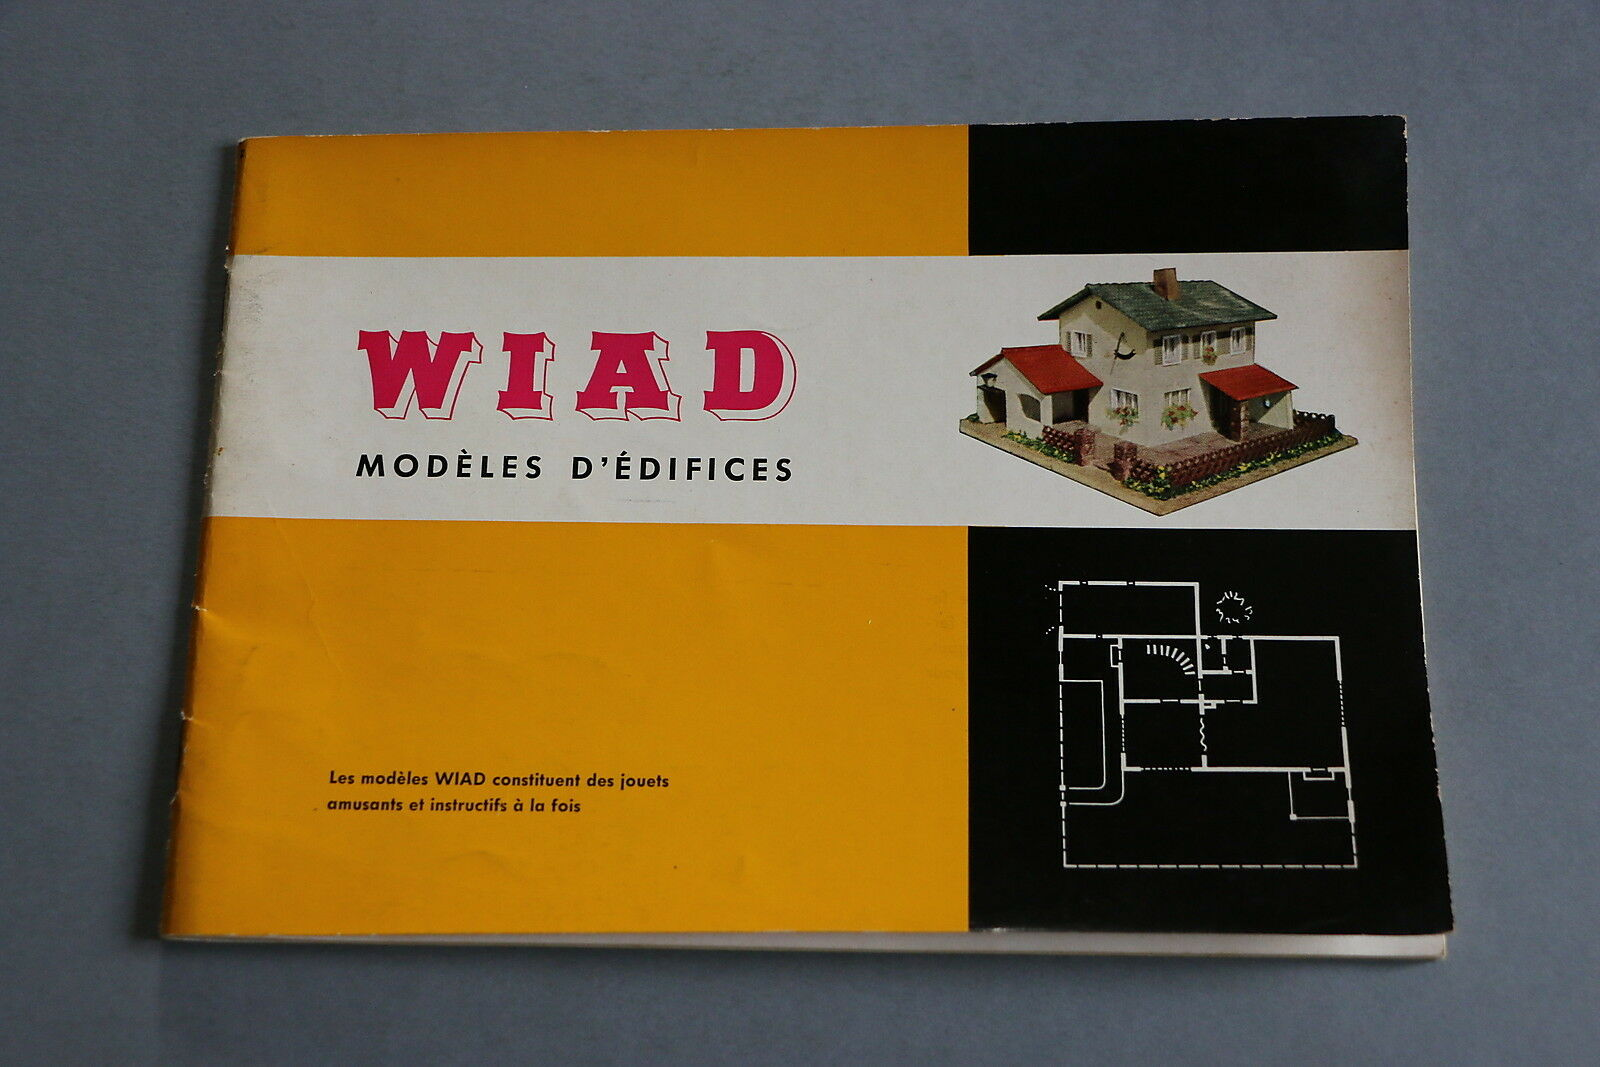 X480 WIAD Train catalogue maquette 38 pages 21*14,8 cm F 1er catalogue français